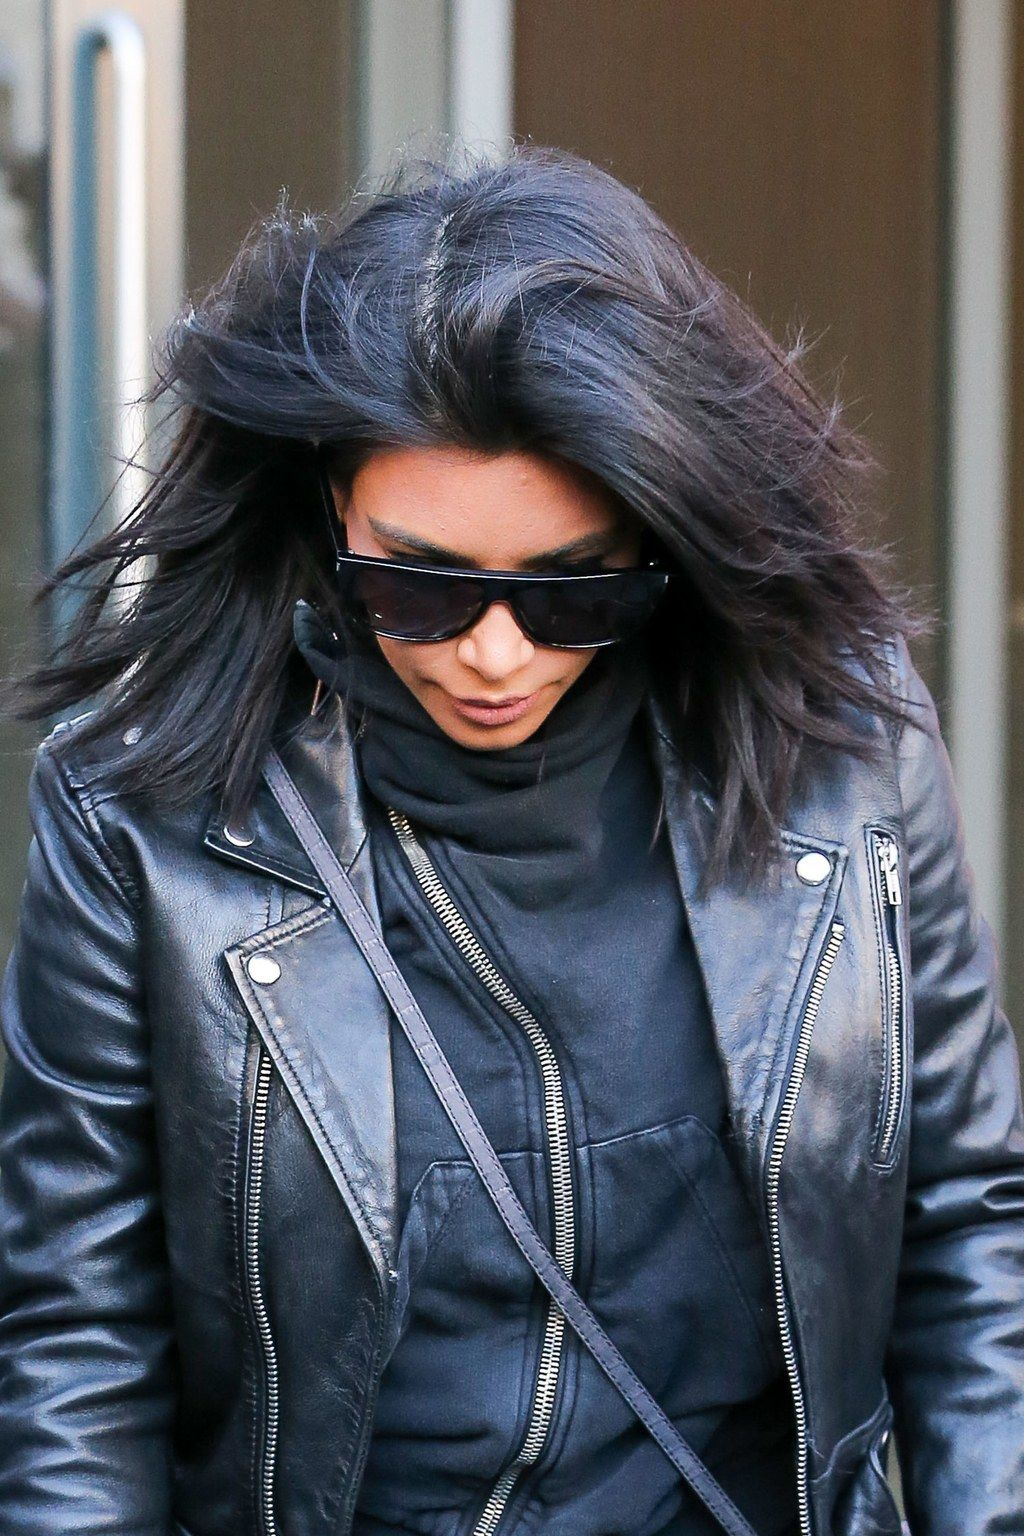 Kim Kardashian Style 2018 - Pinterest 8